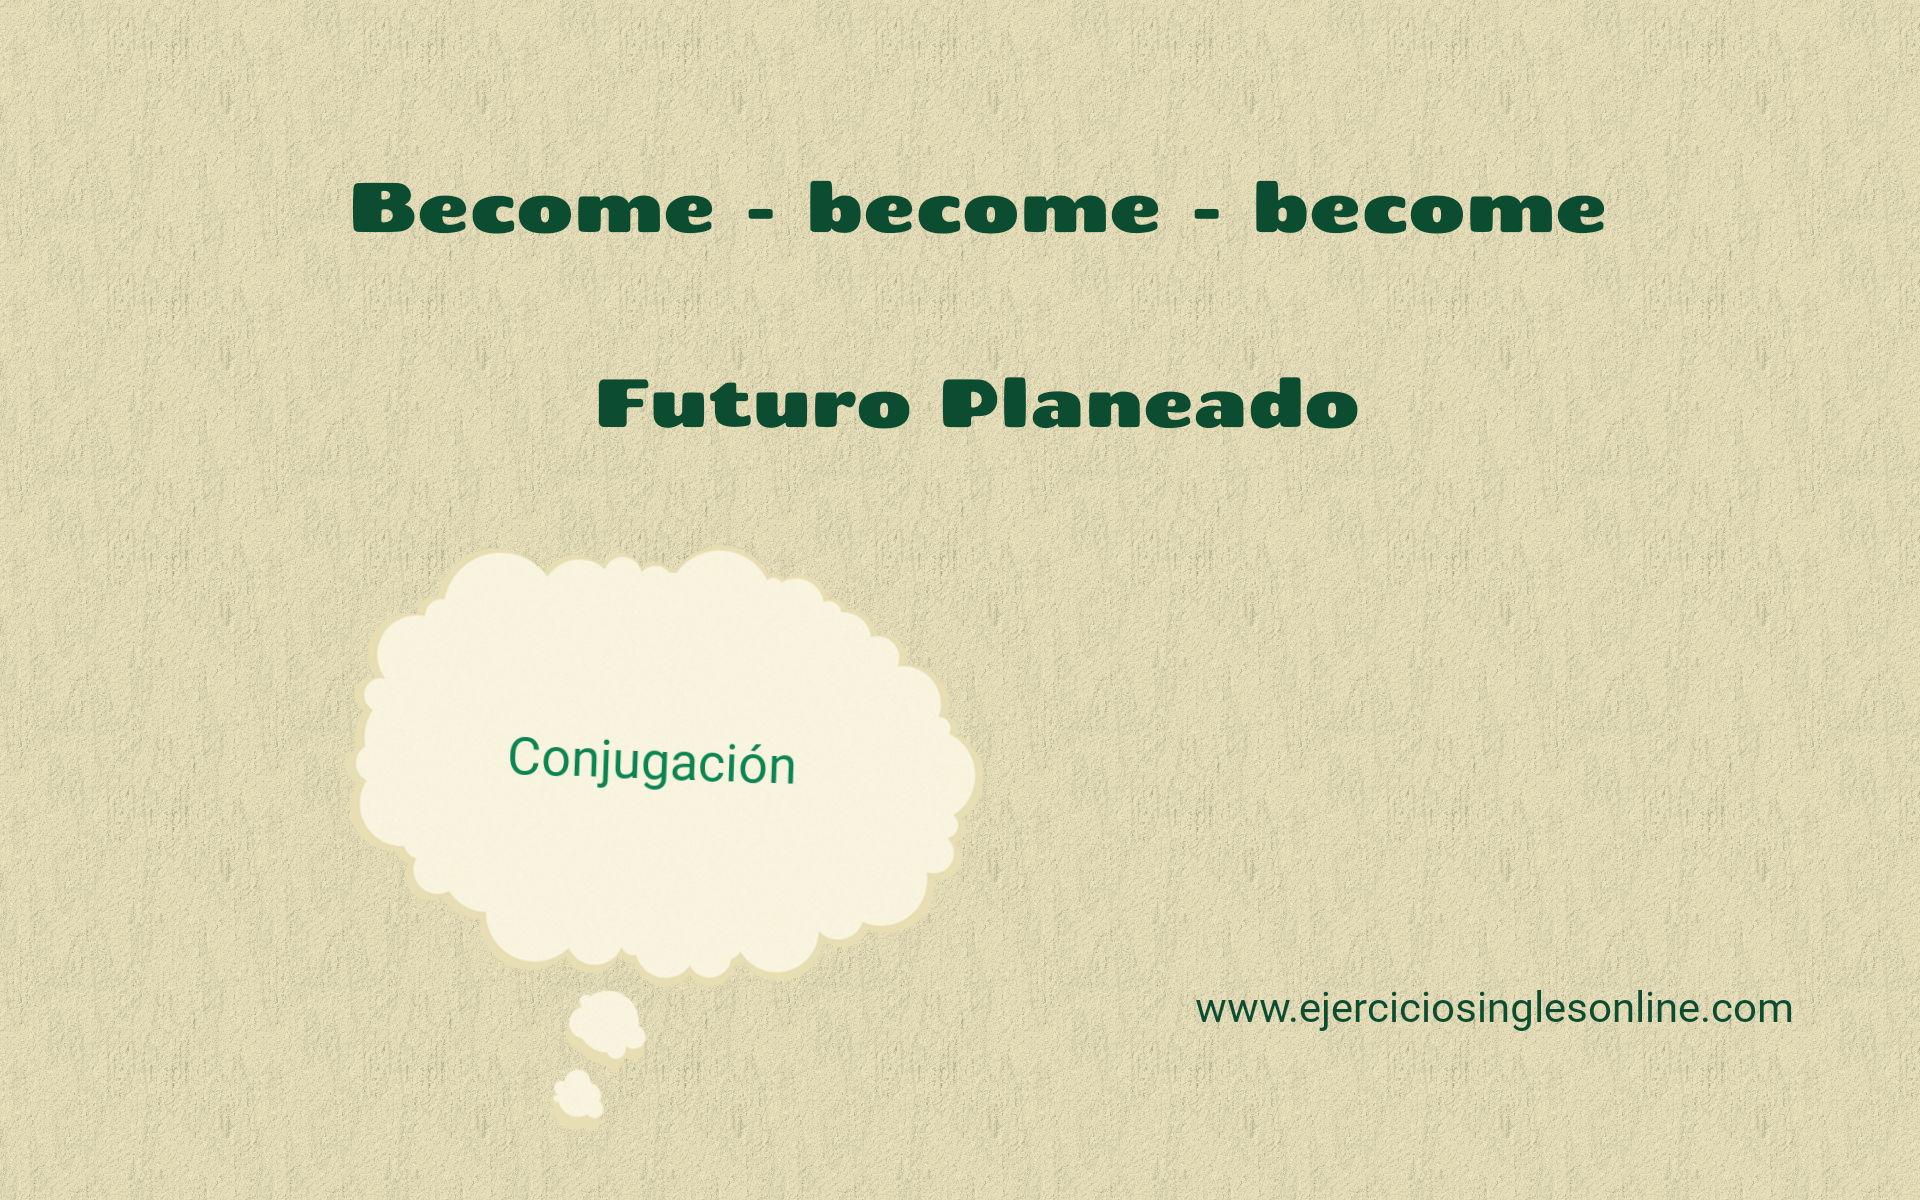 Become - Futuro planeado